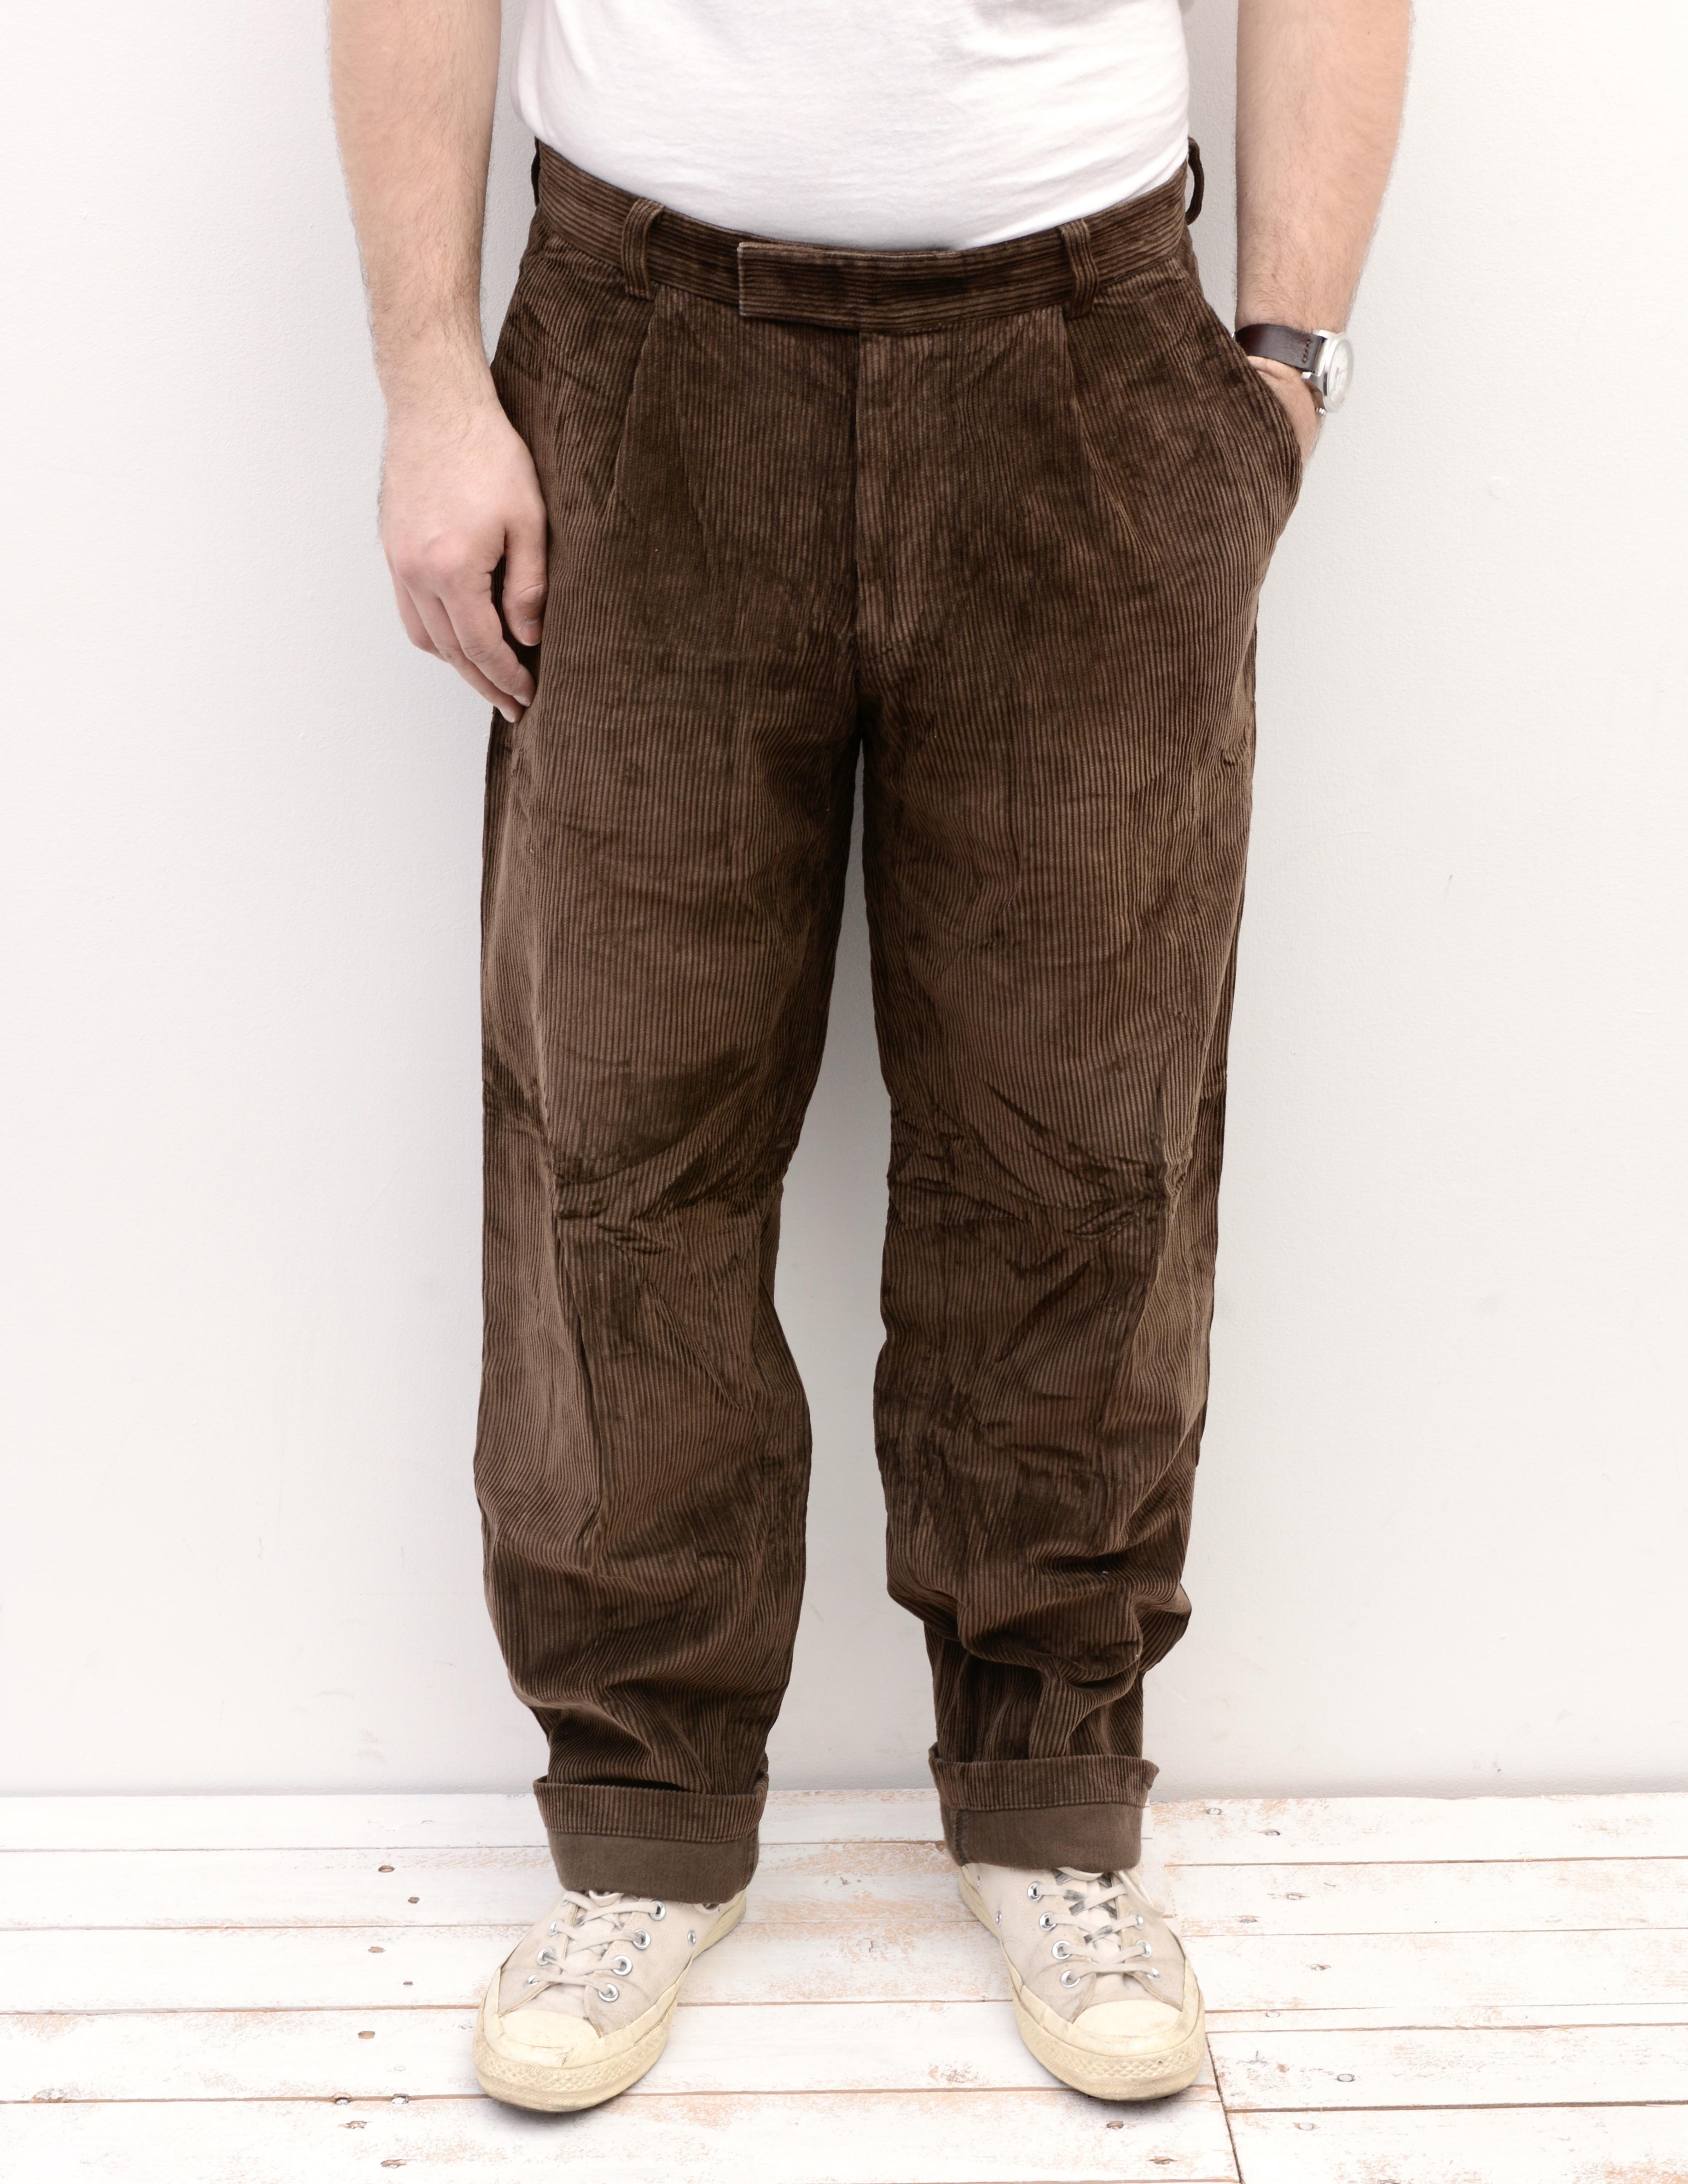 Vintage Light HUGO BOSS Trousers Pants Bottoms